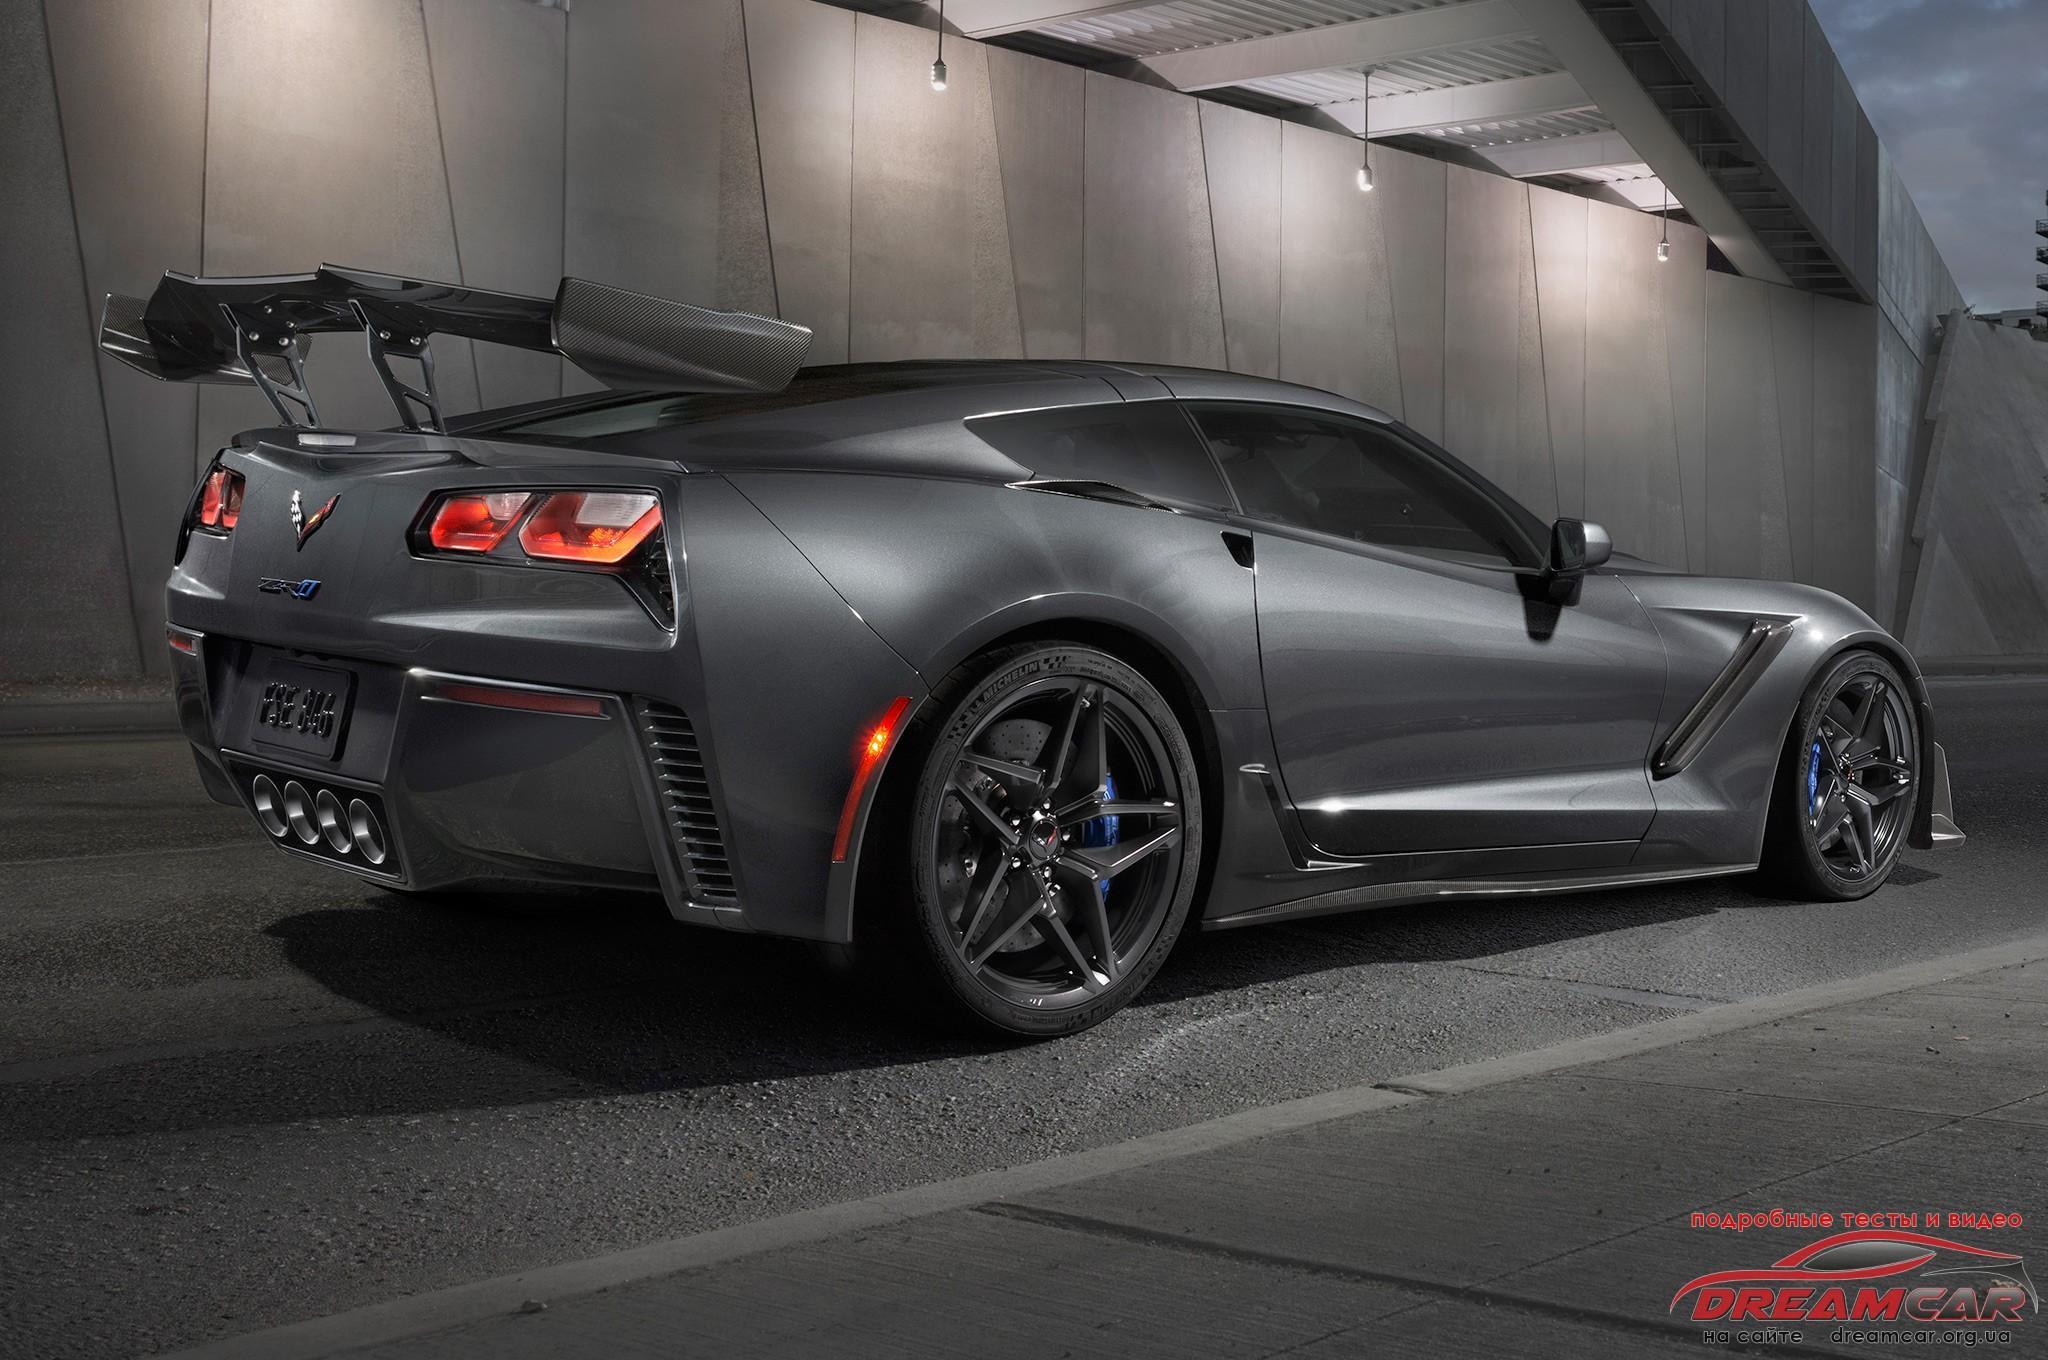 Chevrolet Corvette CZ1 2019 задняя часть